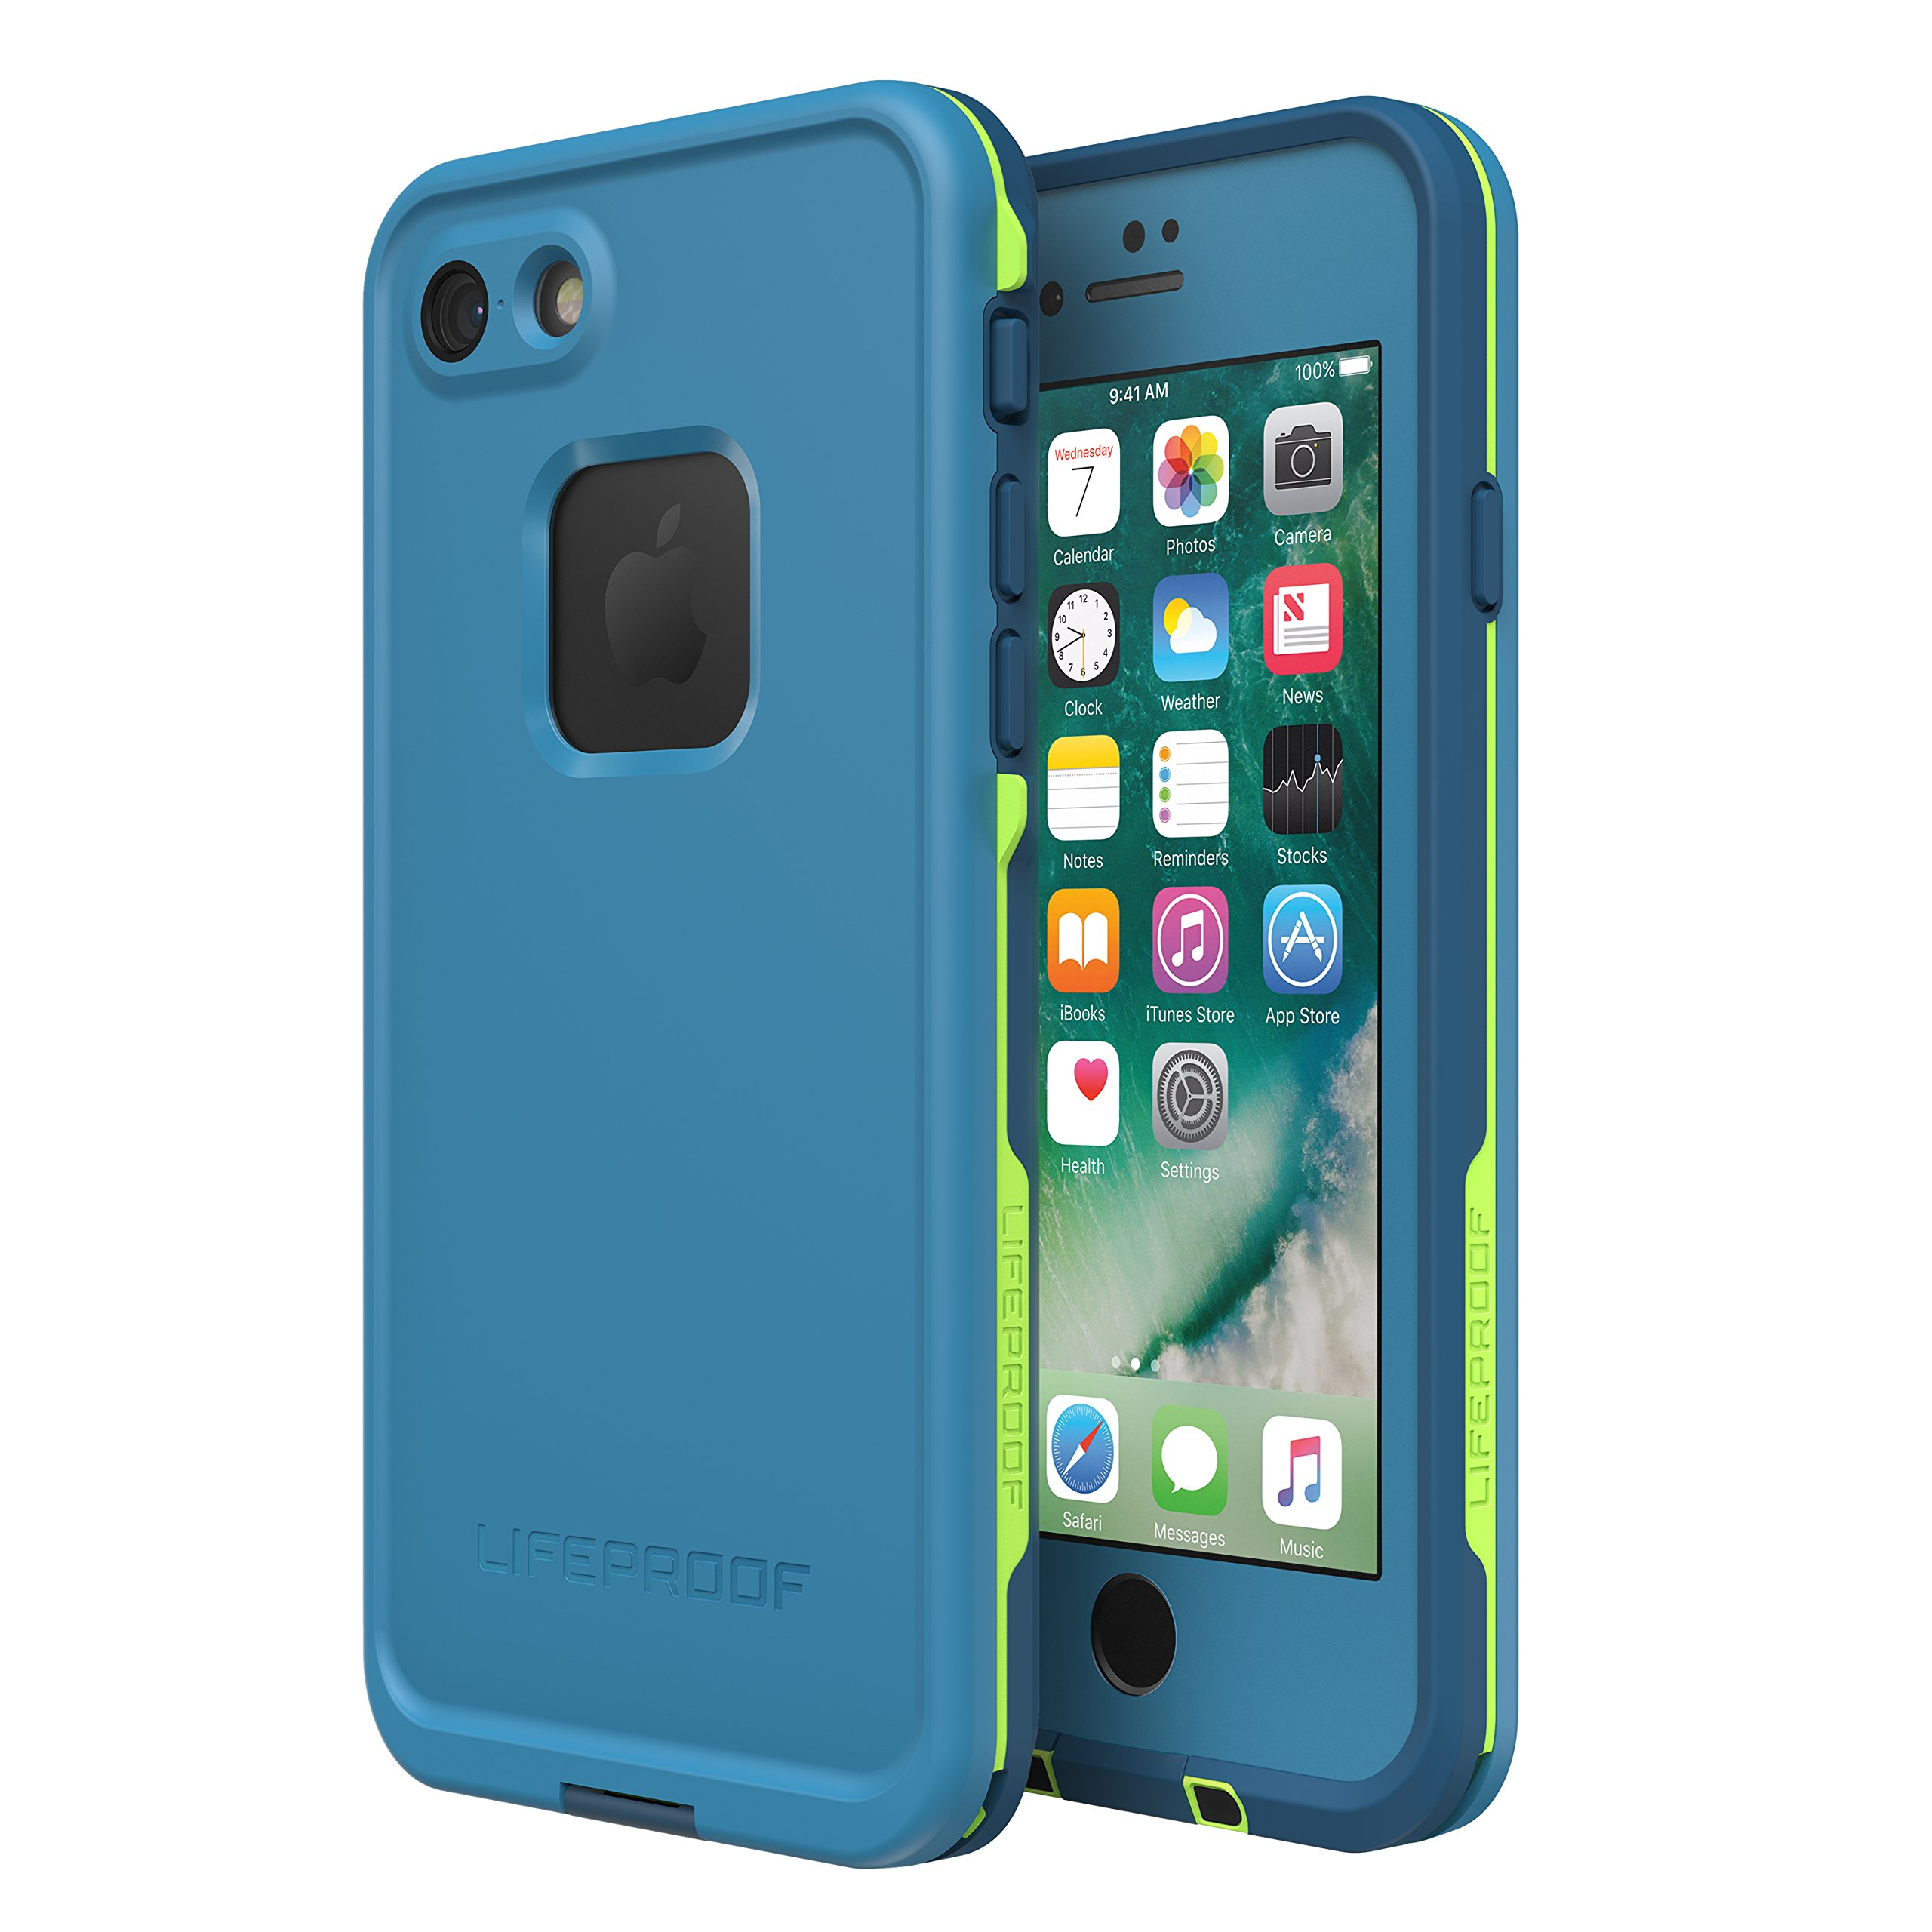 Lifeproof FRĒ SERIES Waterproof Case for iPhone 8 & 7 (ONLY) - Retail Packaging - BANZAI (COWABUNGA/WAVE CRASH/LONGBOARD) by LifeProof